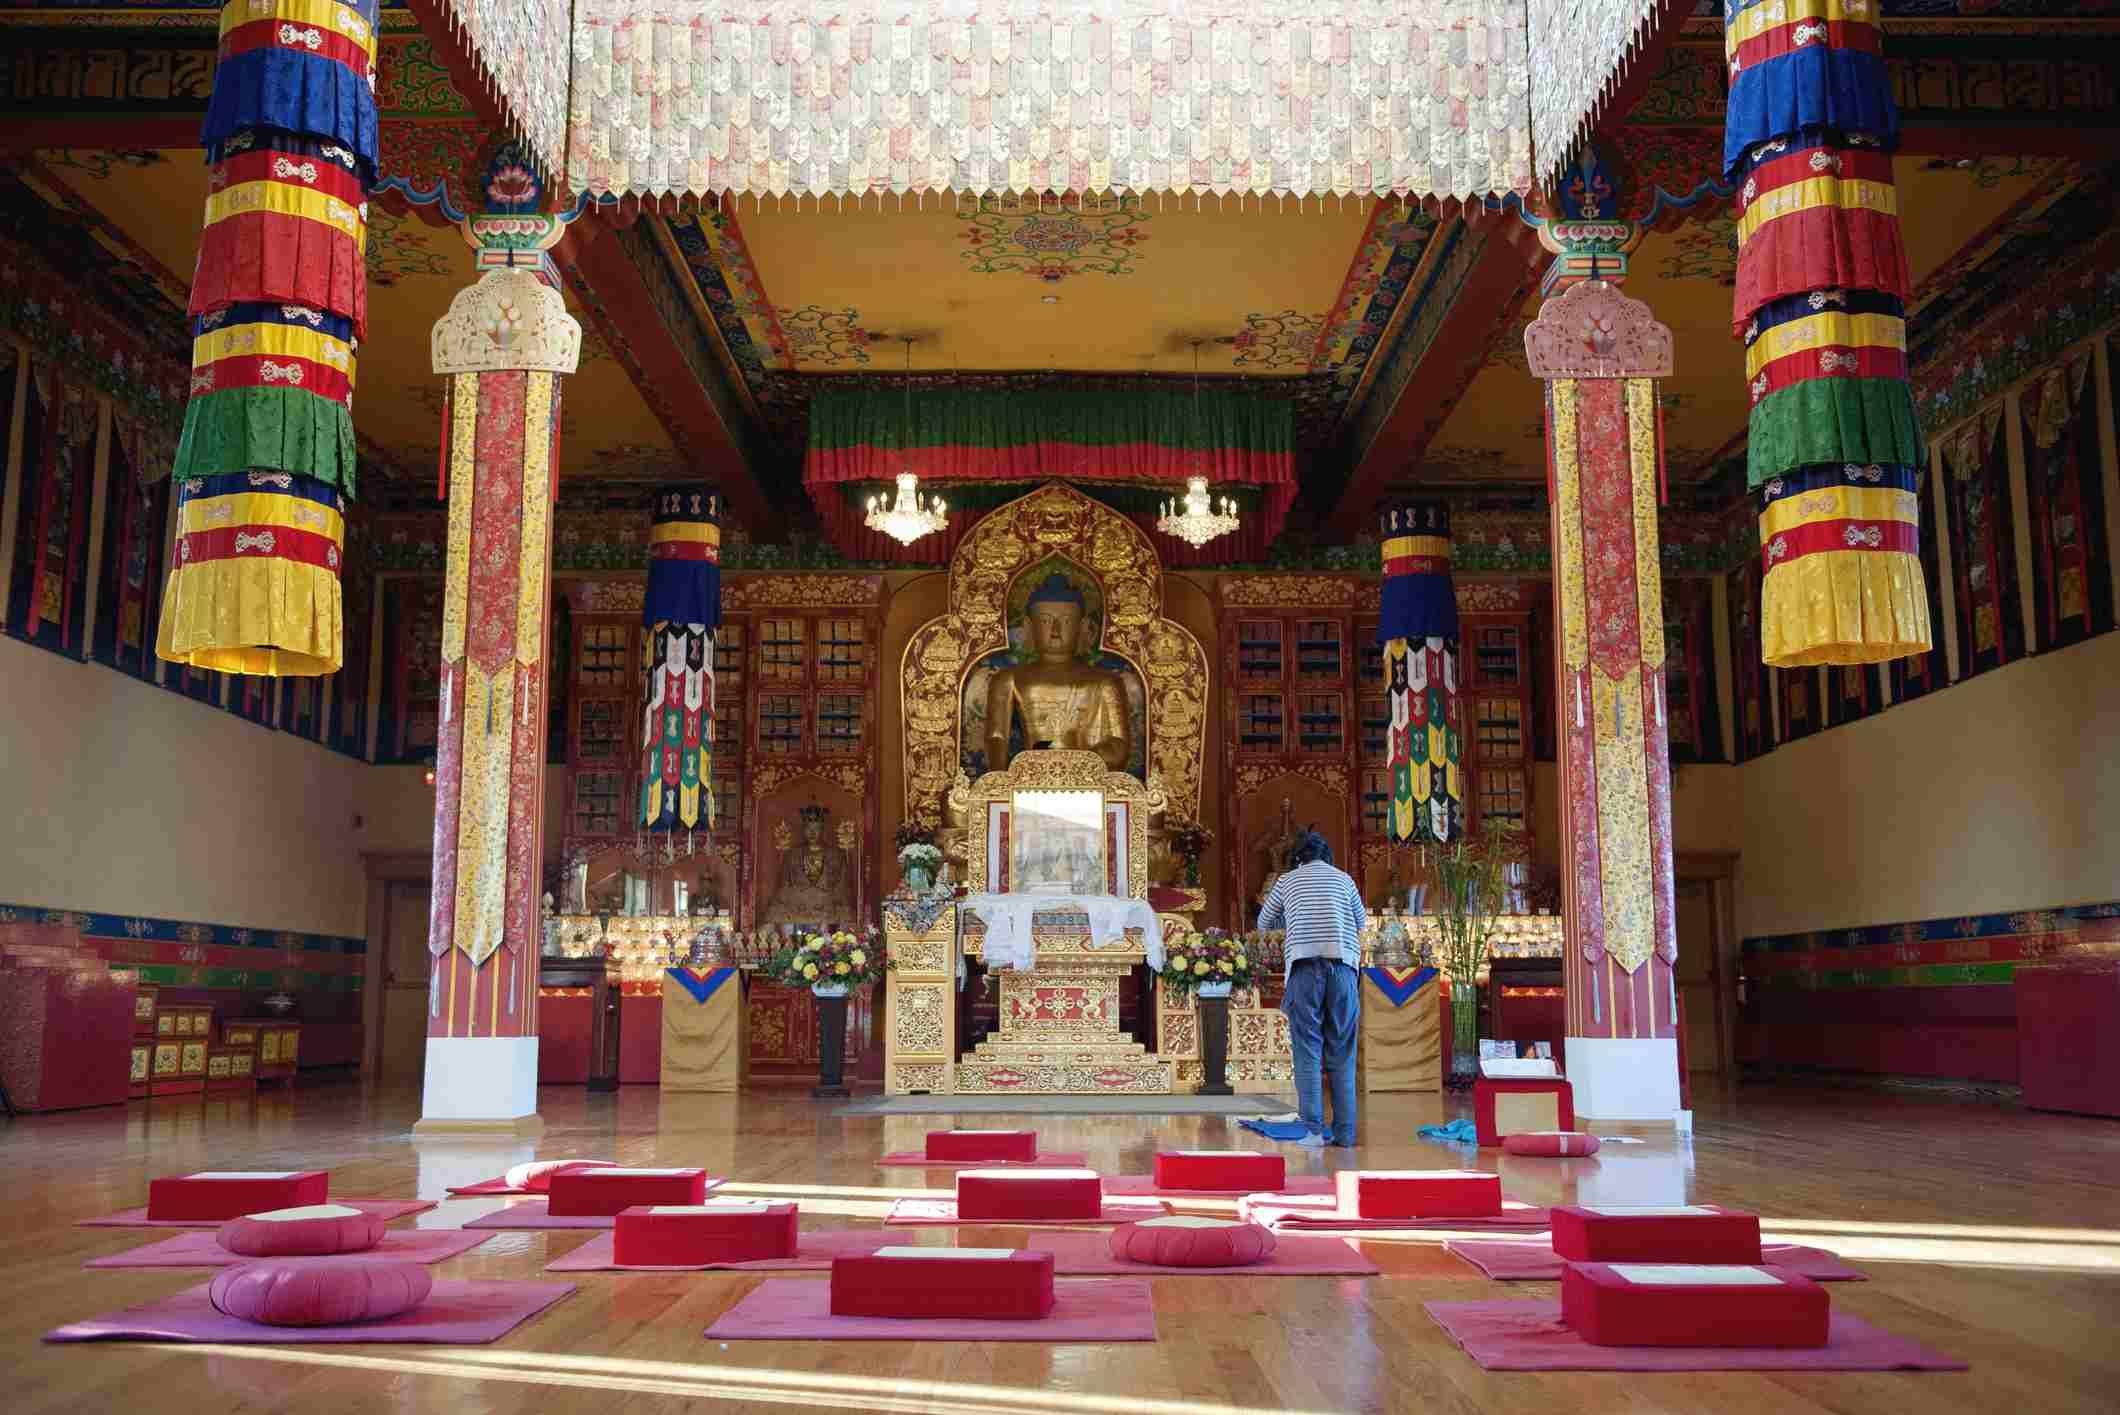 Shrine in Karma Triyana Dharmachakra Tibetan Buddhist Monastery, Woodstock, New York, USA